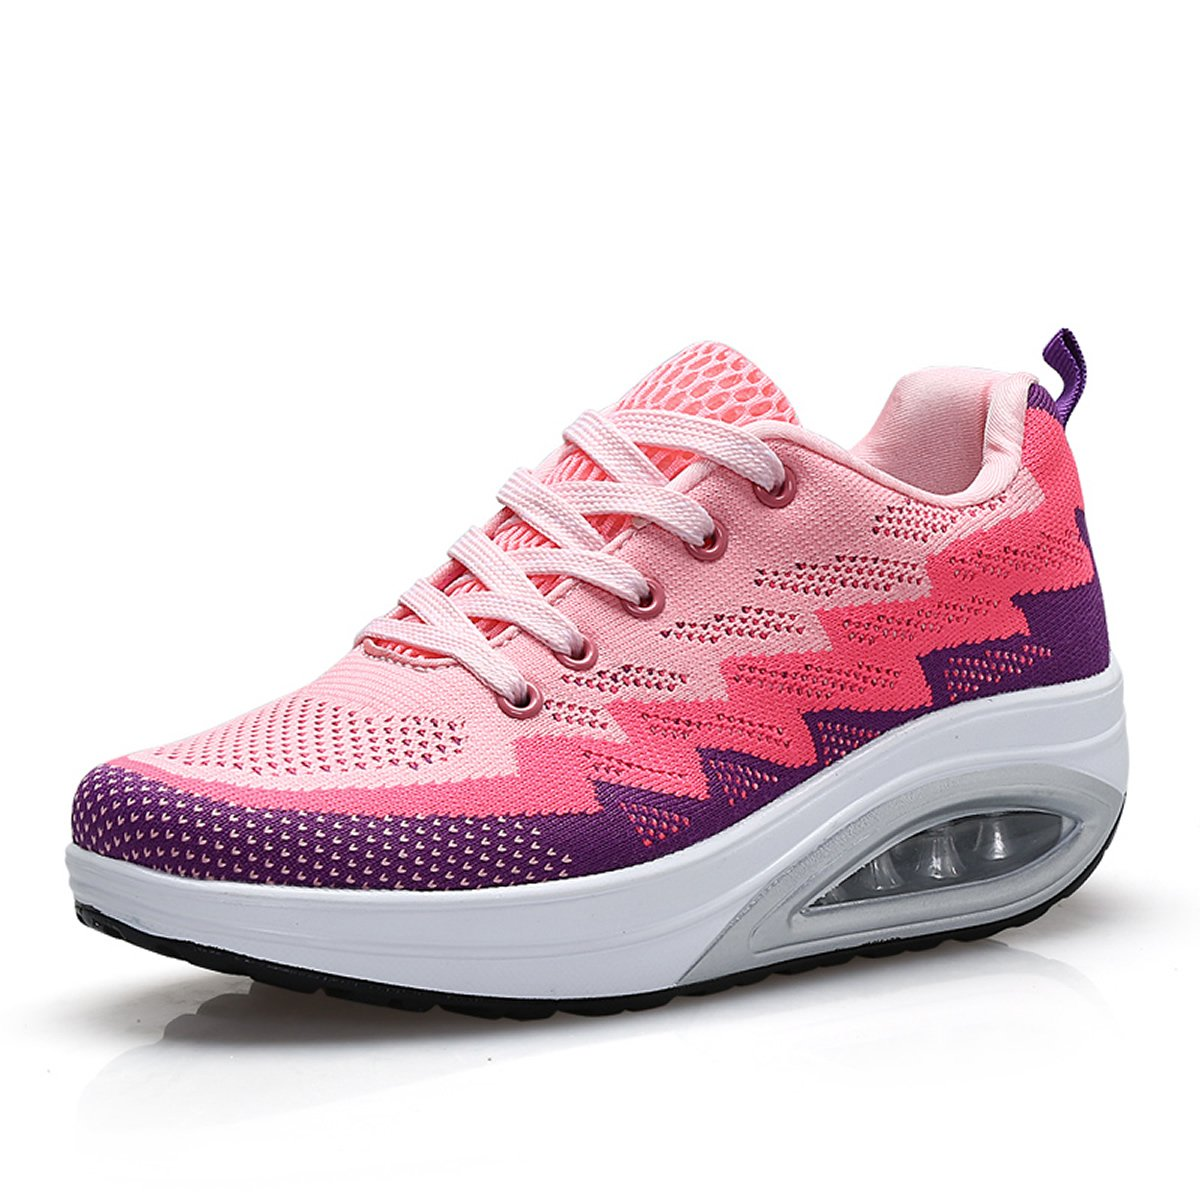 JARLIF Women's Comfortable Platform Walking Sneakers Lightweight Casual Tennis Air Fitness Shoes US5.5-10 B071P4XRG3 8 B(M) Women / 6.5 D(M) Men / EU 39|Pink